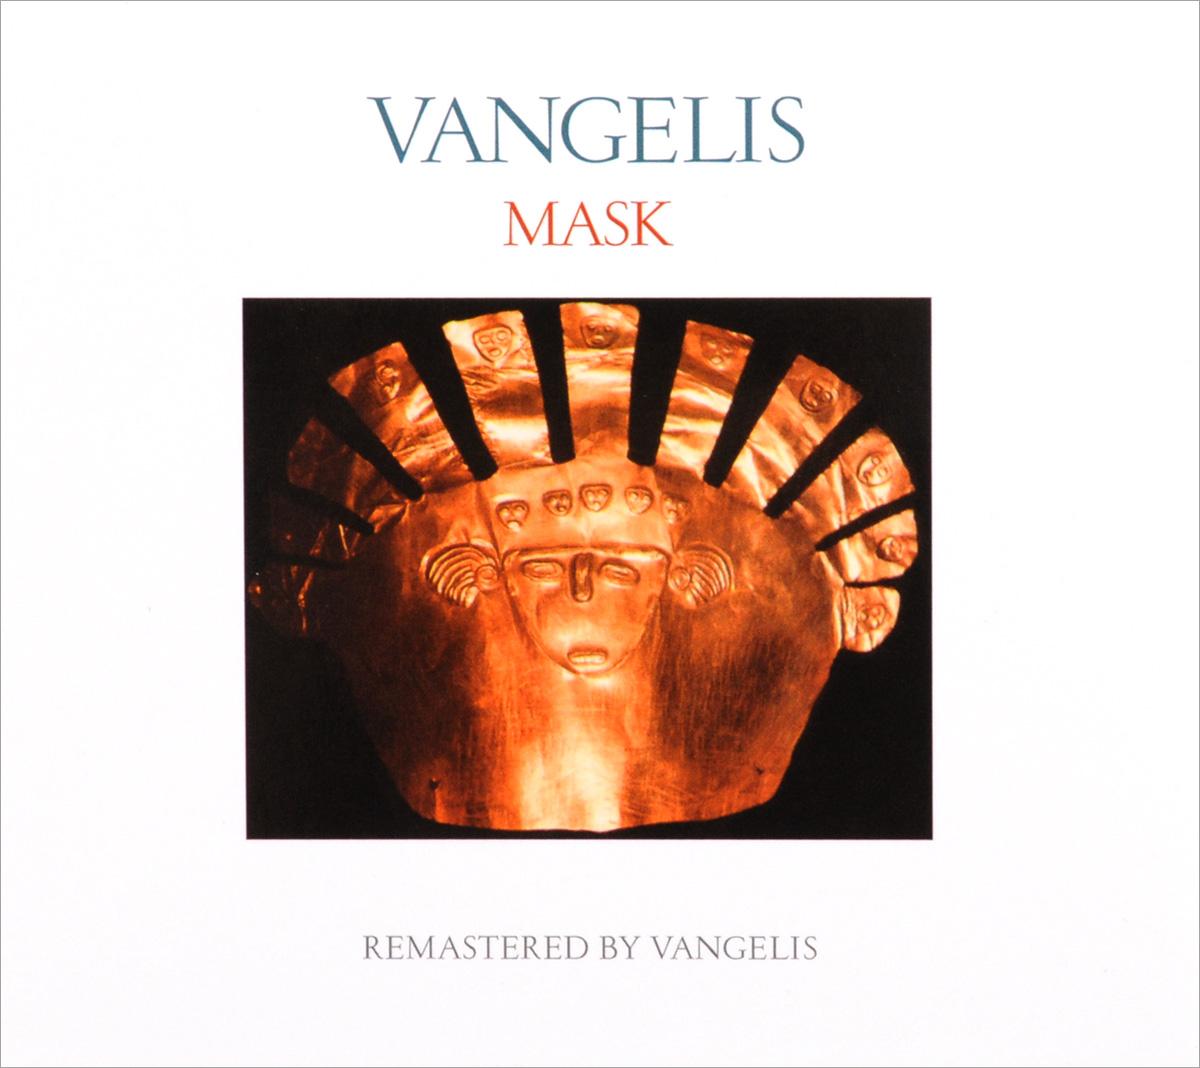 Вангелис Vangelis. Mask вангелис vangelis greatest hits 2 cd